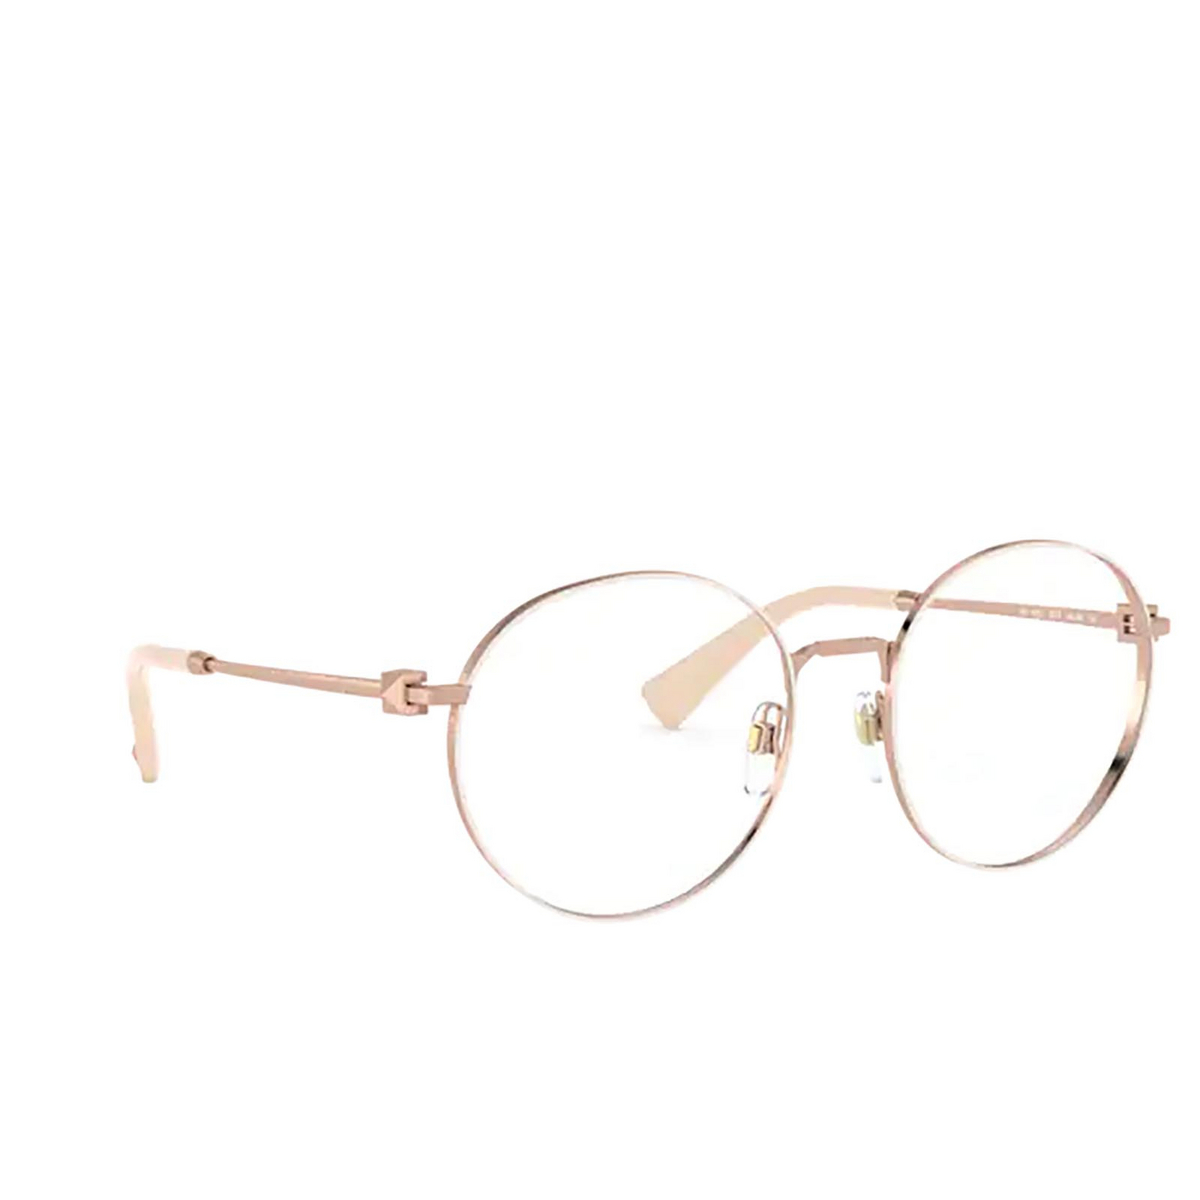 Valentino® Round Eyeglasses: VA1020 color Rose Gold / Beige 3013 - three-quarters view.